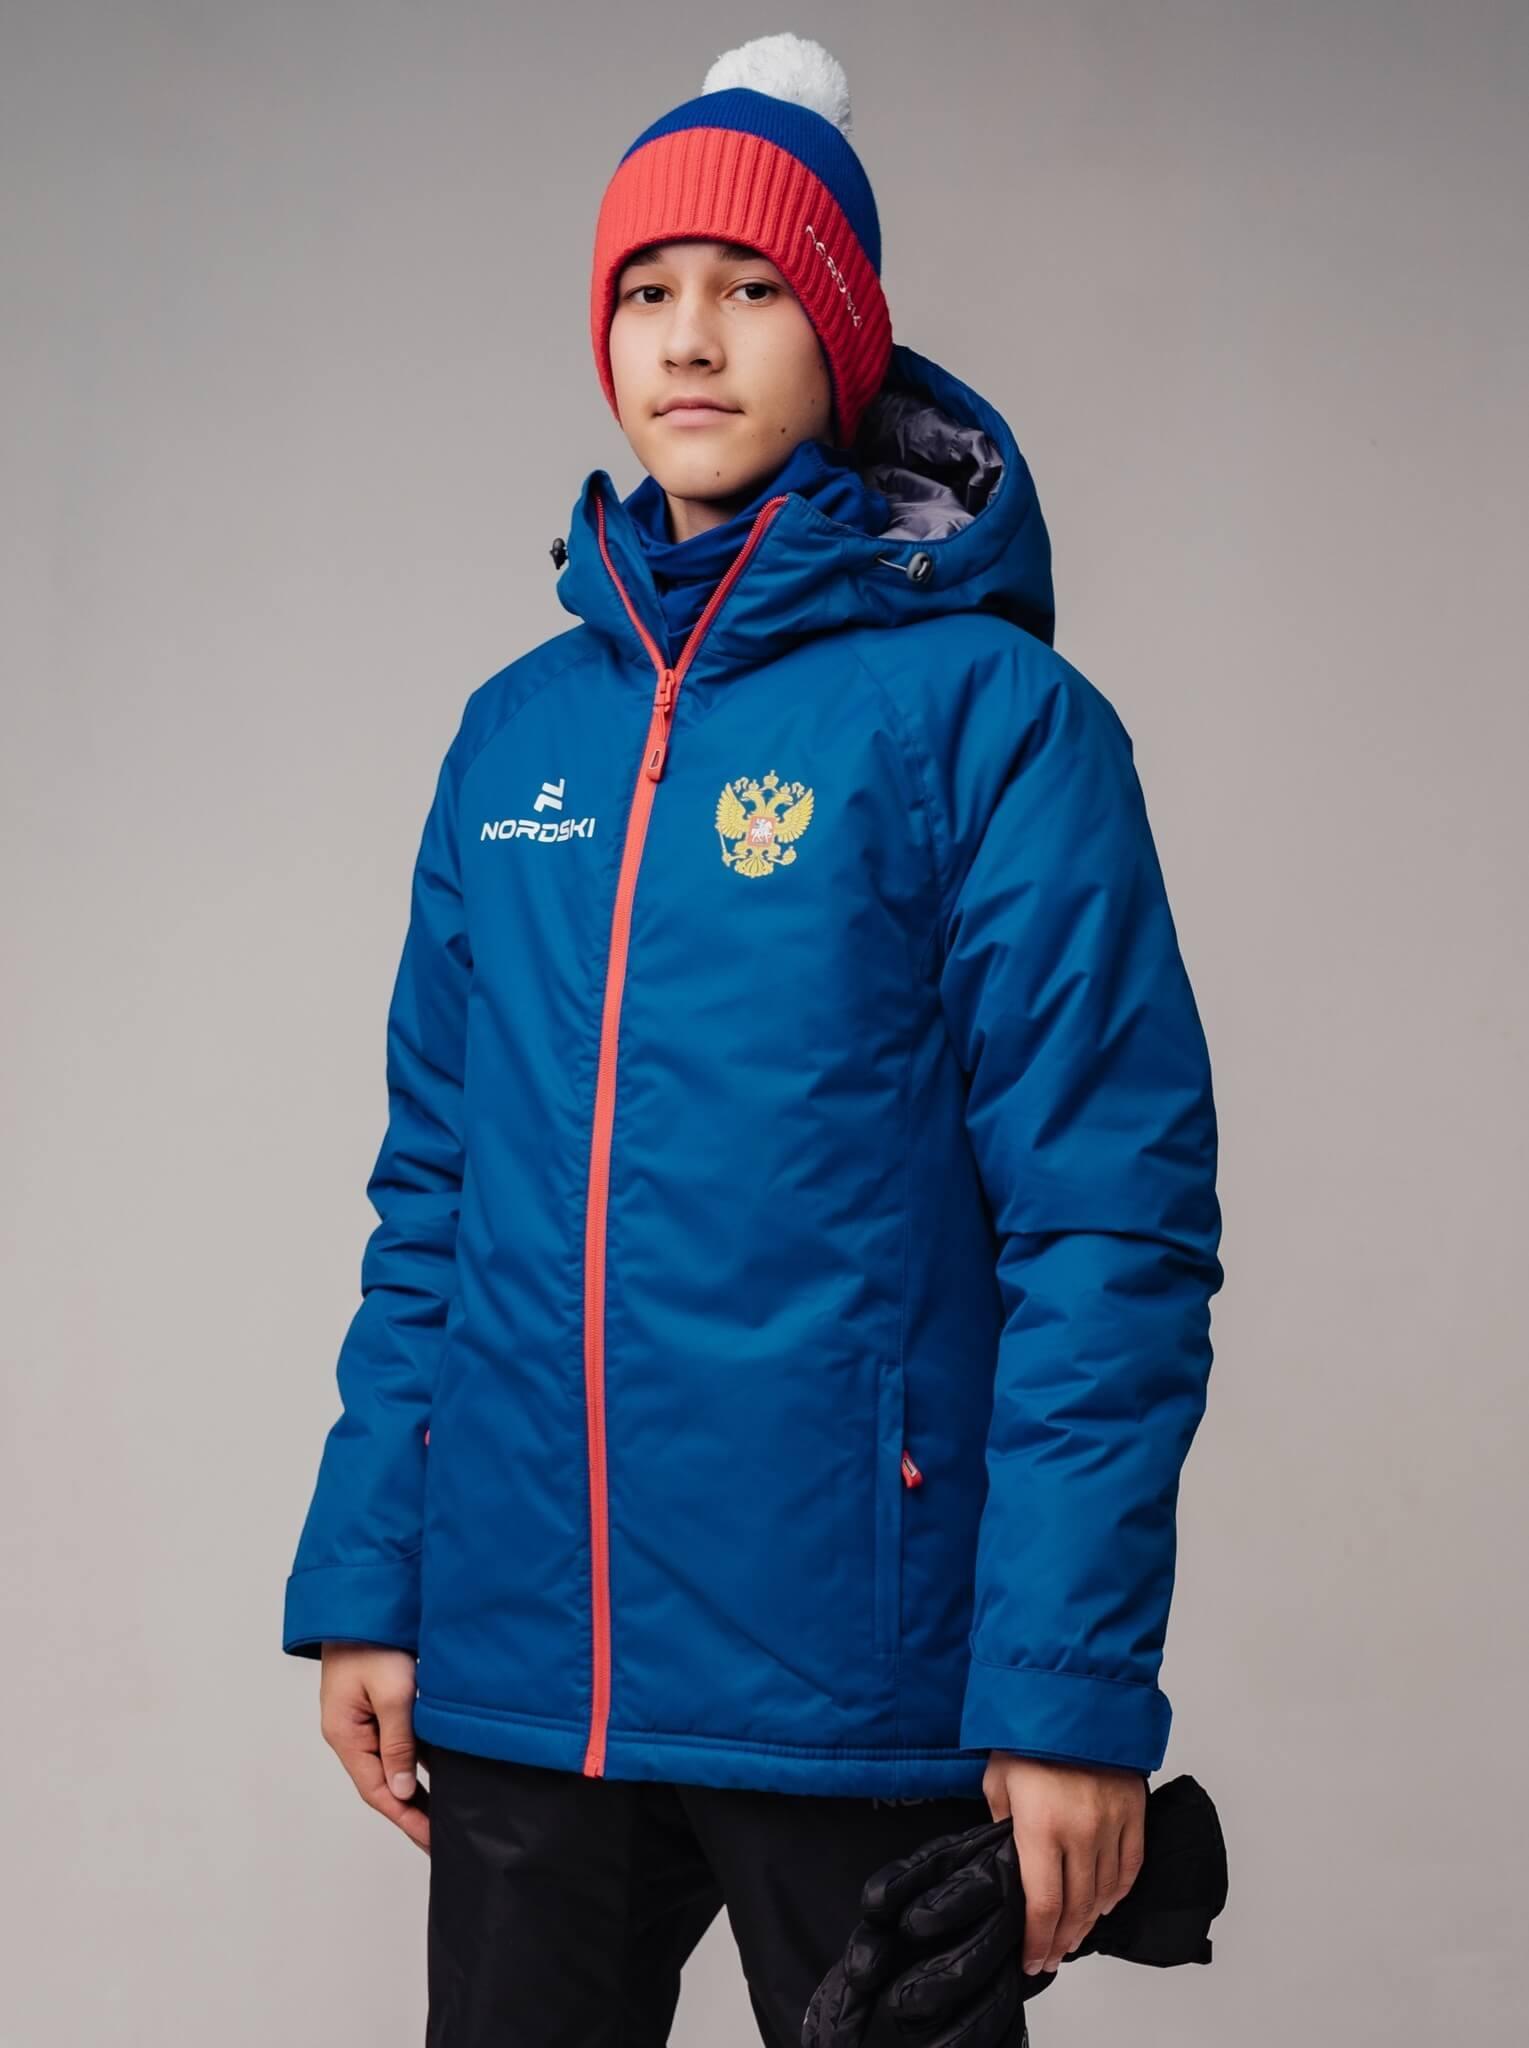 Nordski Jr Motion Patriot утепленная прогулочная лыжная куртка детская - 4